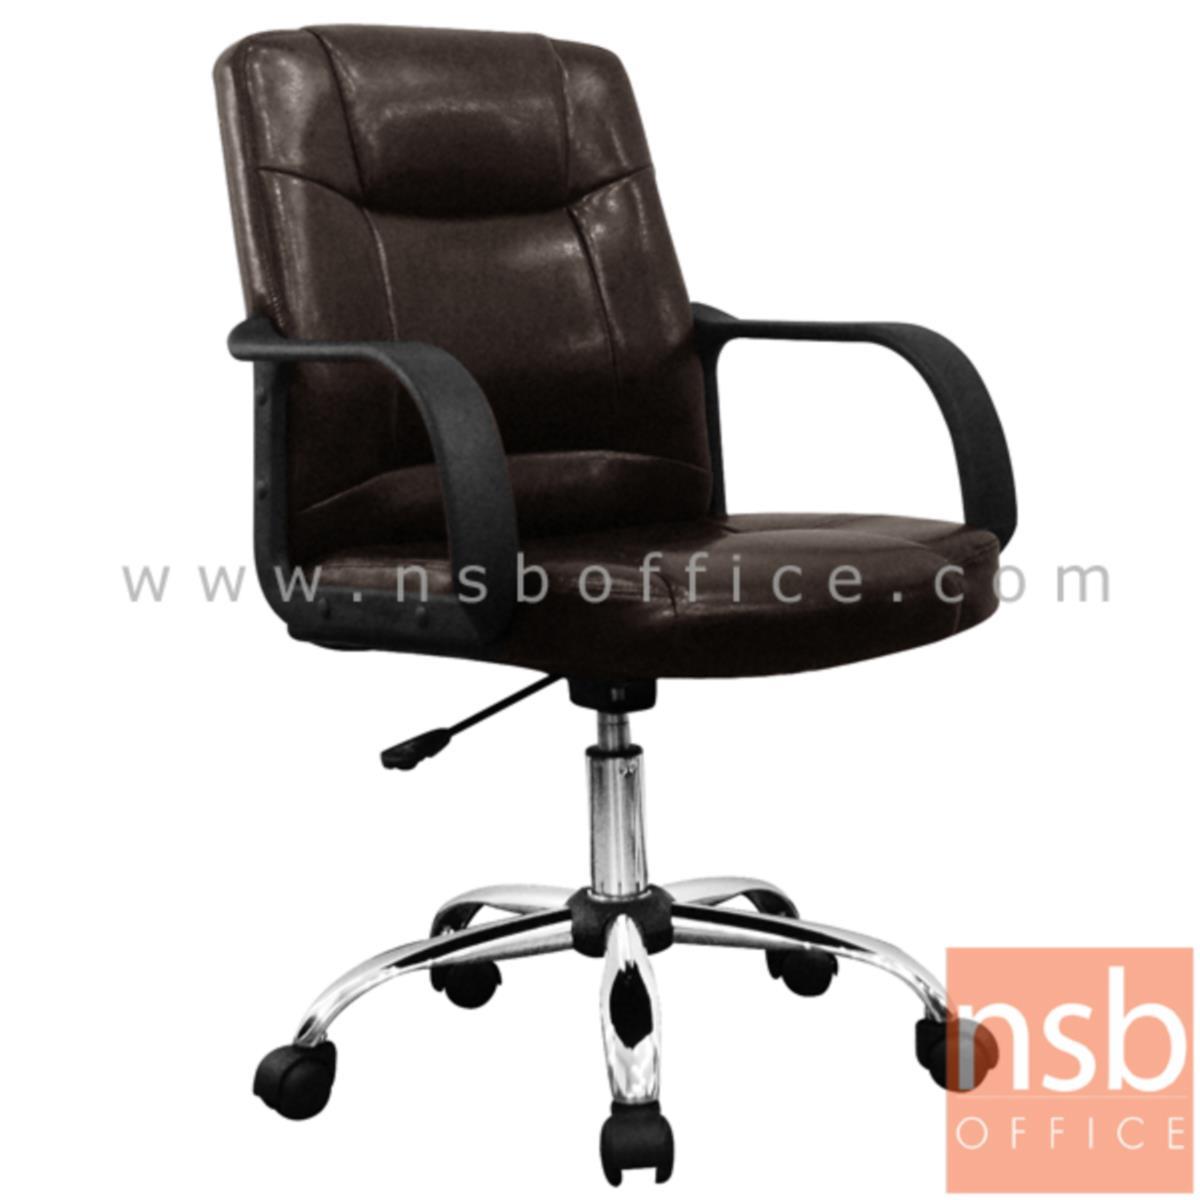 B03A326:เก้าอี้สำนักงาน รุ่น Aucoin (ออคอยน์)  โช๊คแก๊ส ขาเหล็กชุบโครเมี่ยม